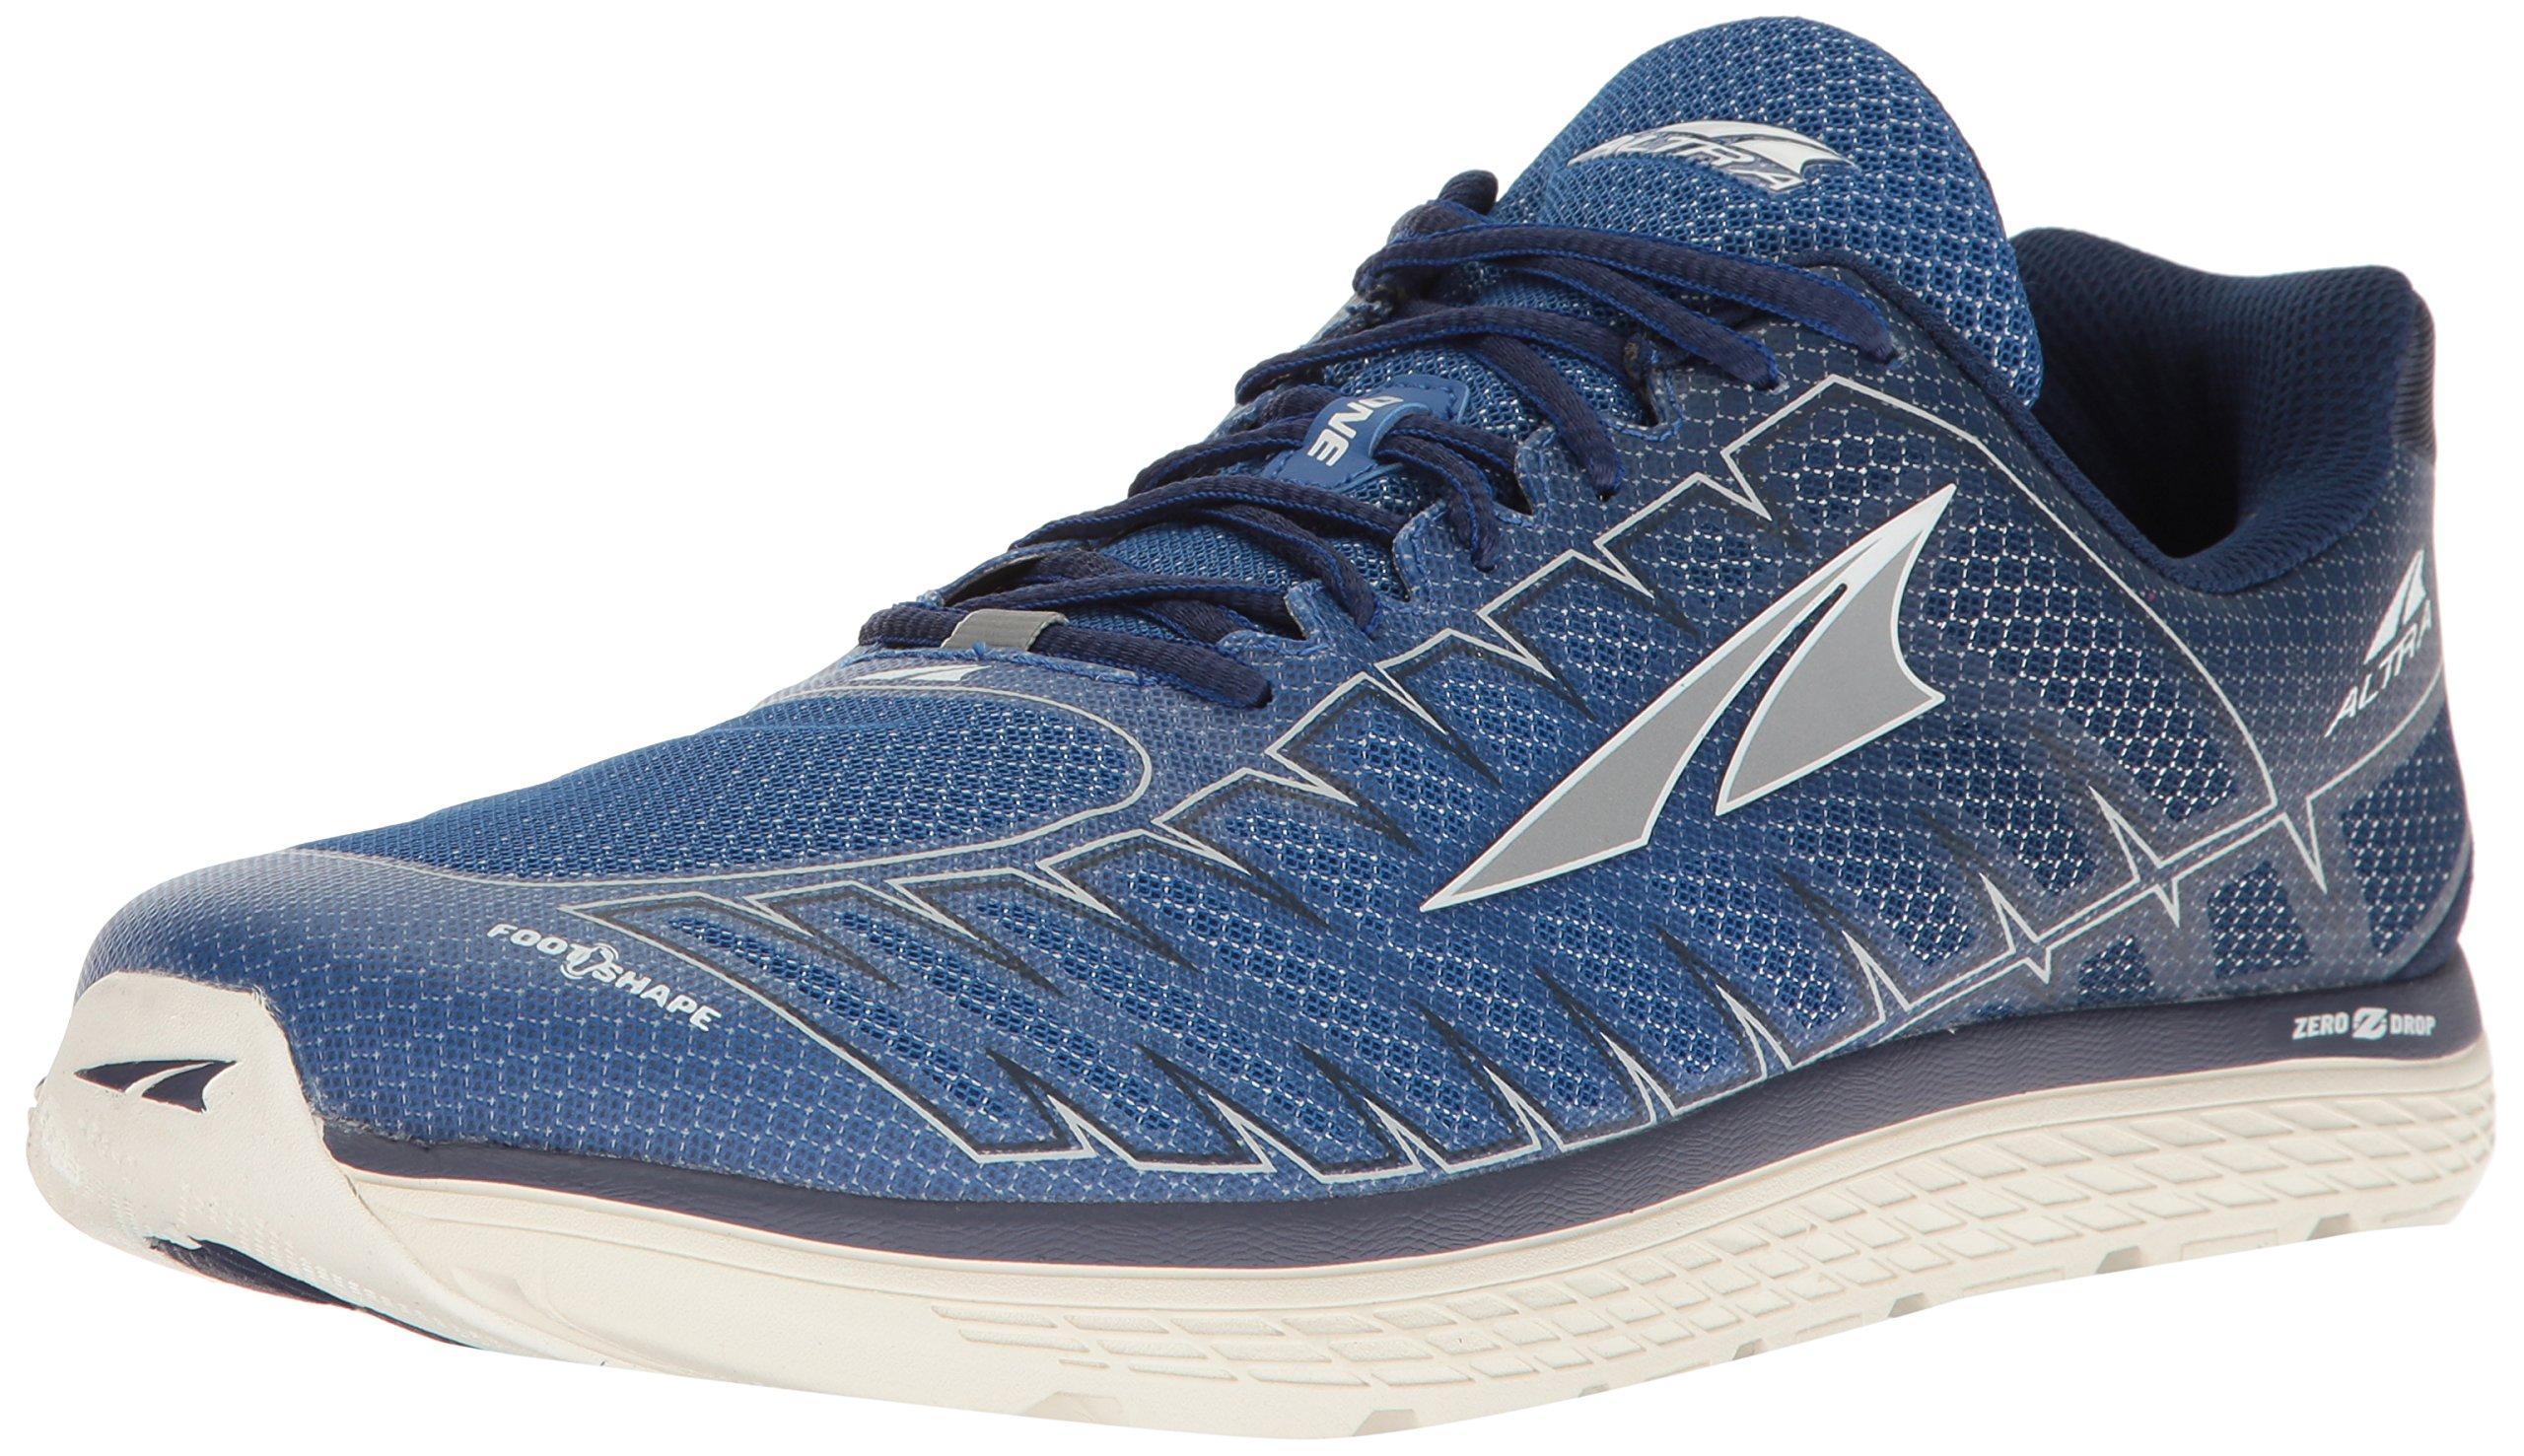 Altra Men's One V3 Running-Shoes, Blue/Gray, 13